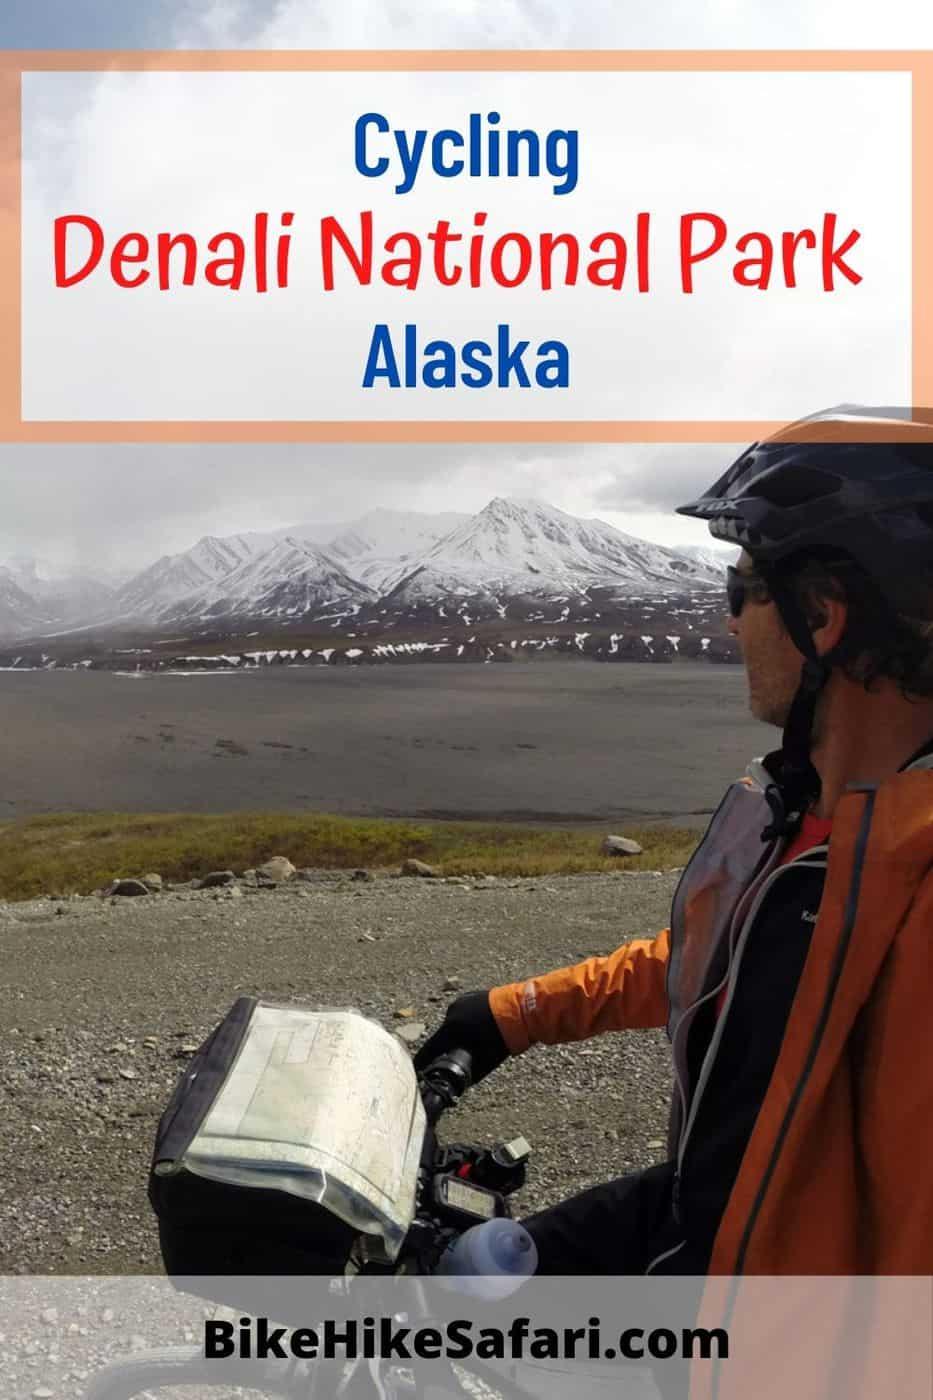 Cycling Denali National Park Alaska